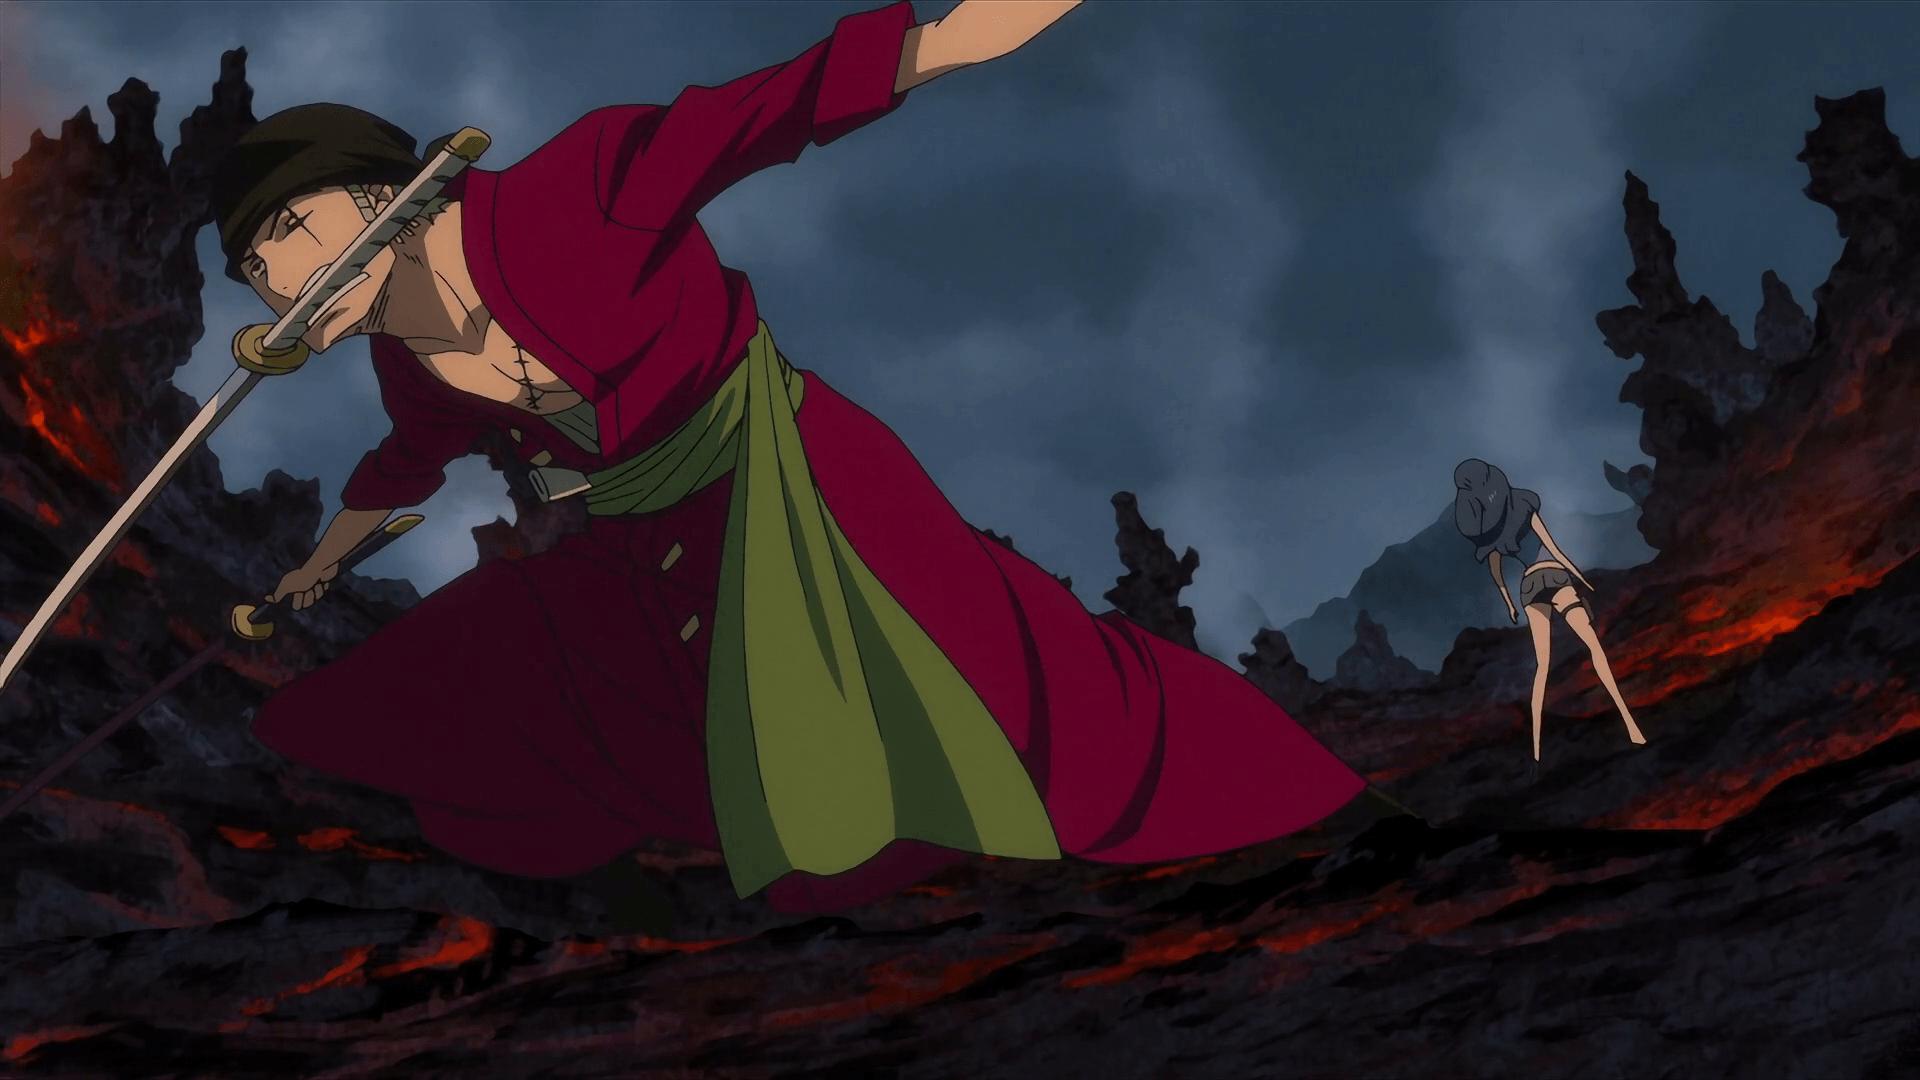 Haki One Piece Zoro Wallpapers - Top Free Haki One Piece ...